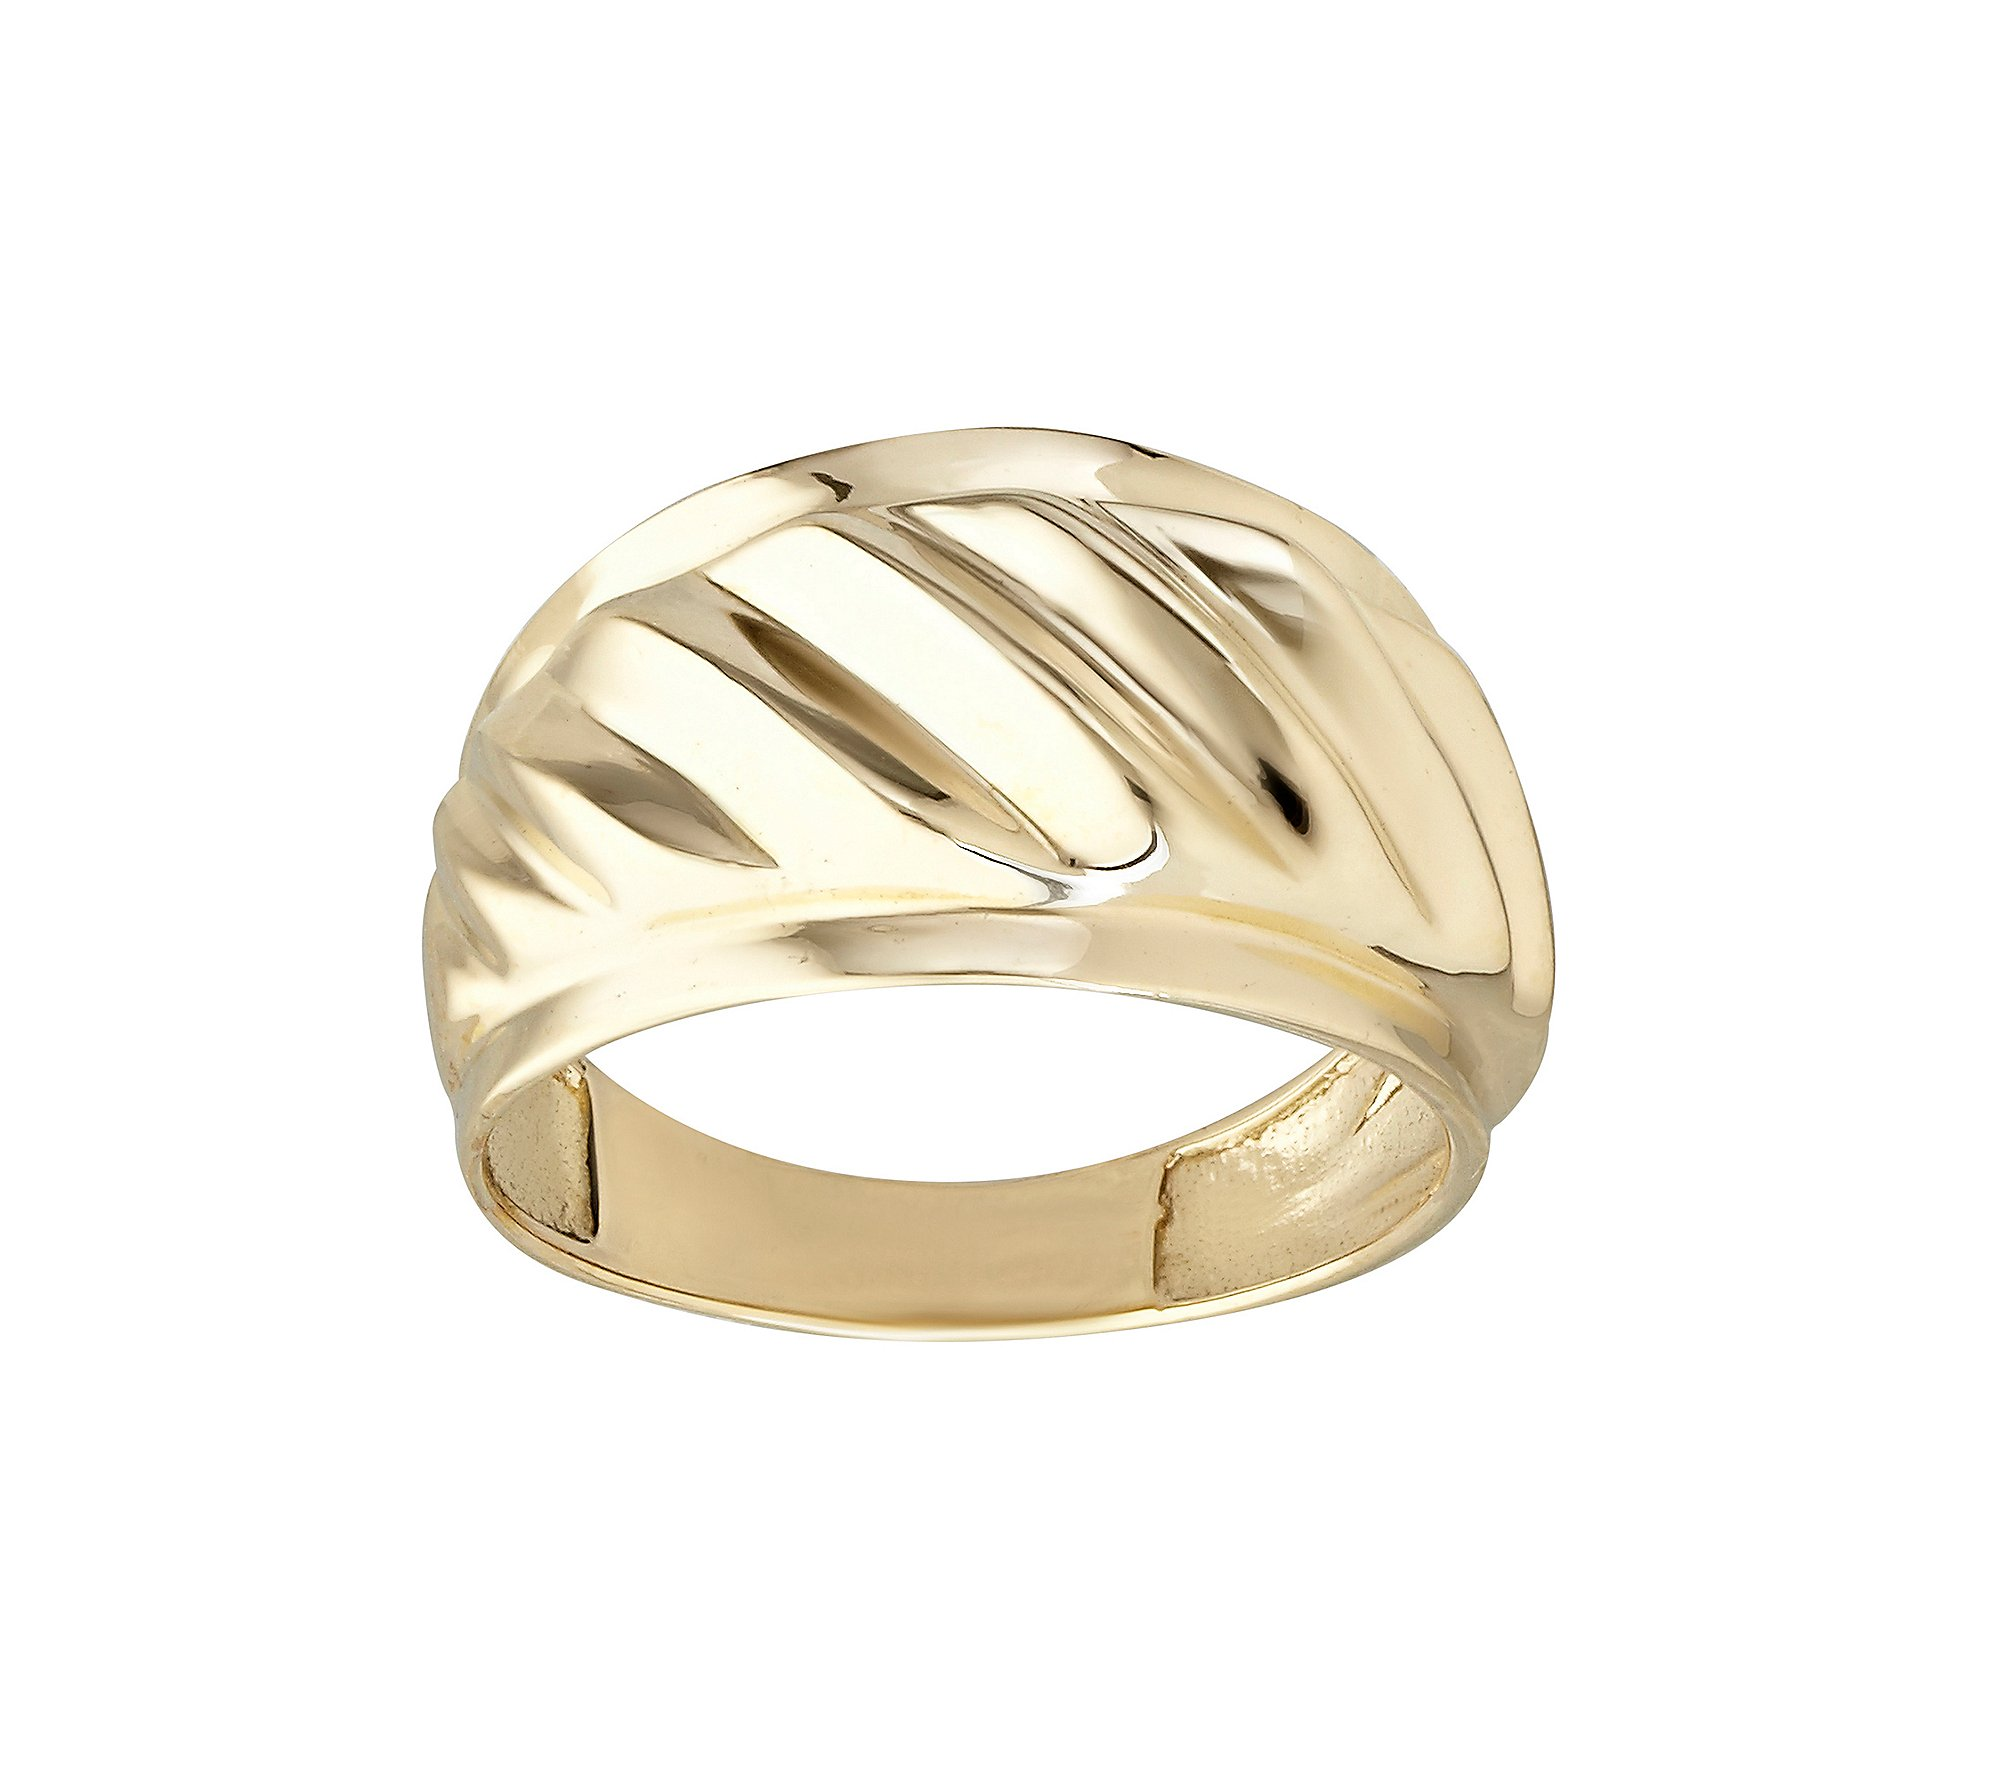 Polished Ribbed Band Ring 10K Yellow Gold